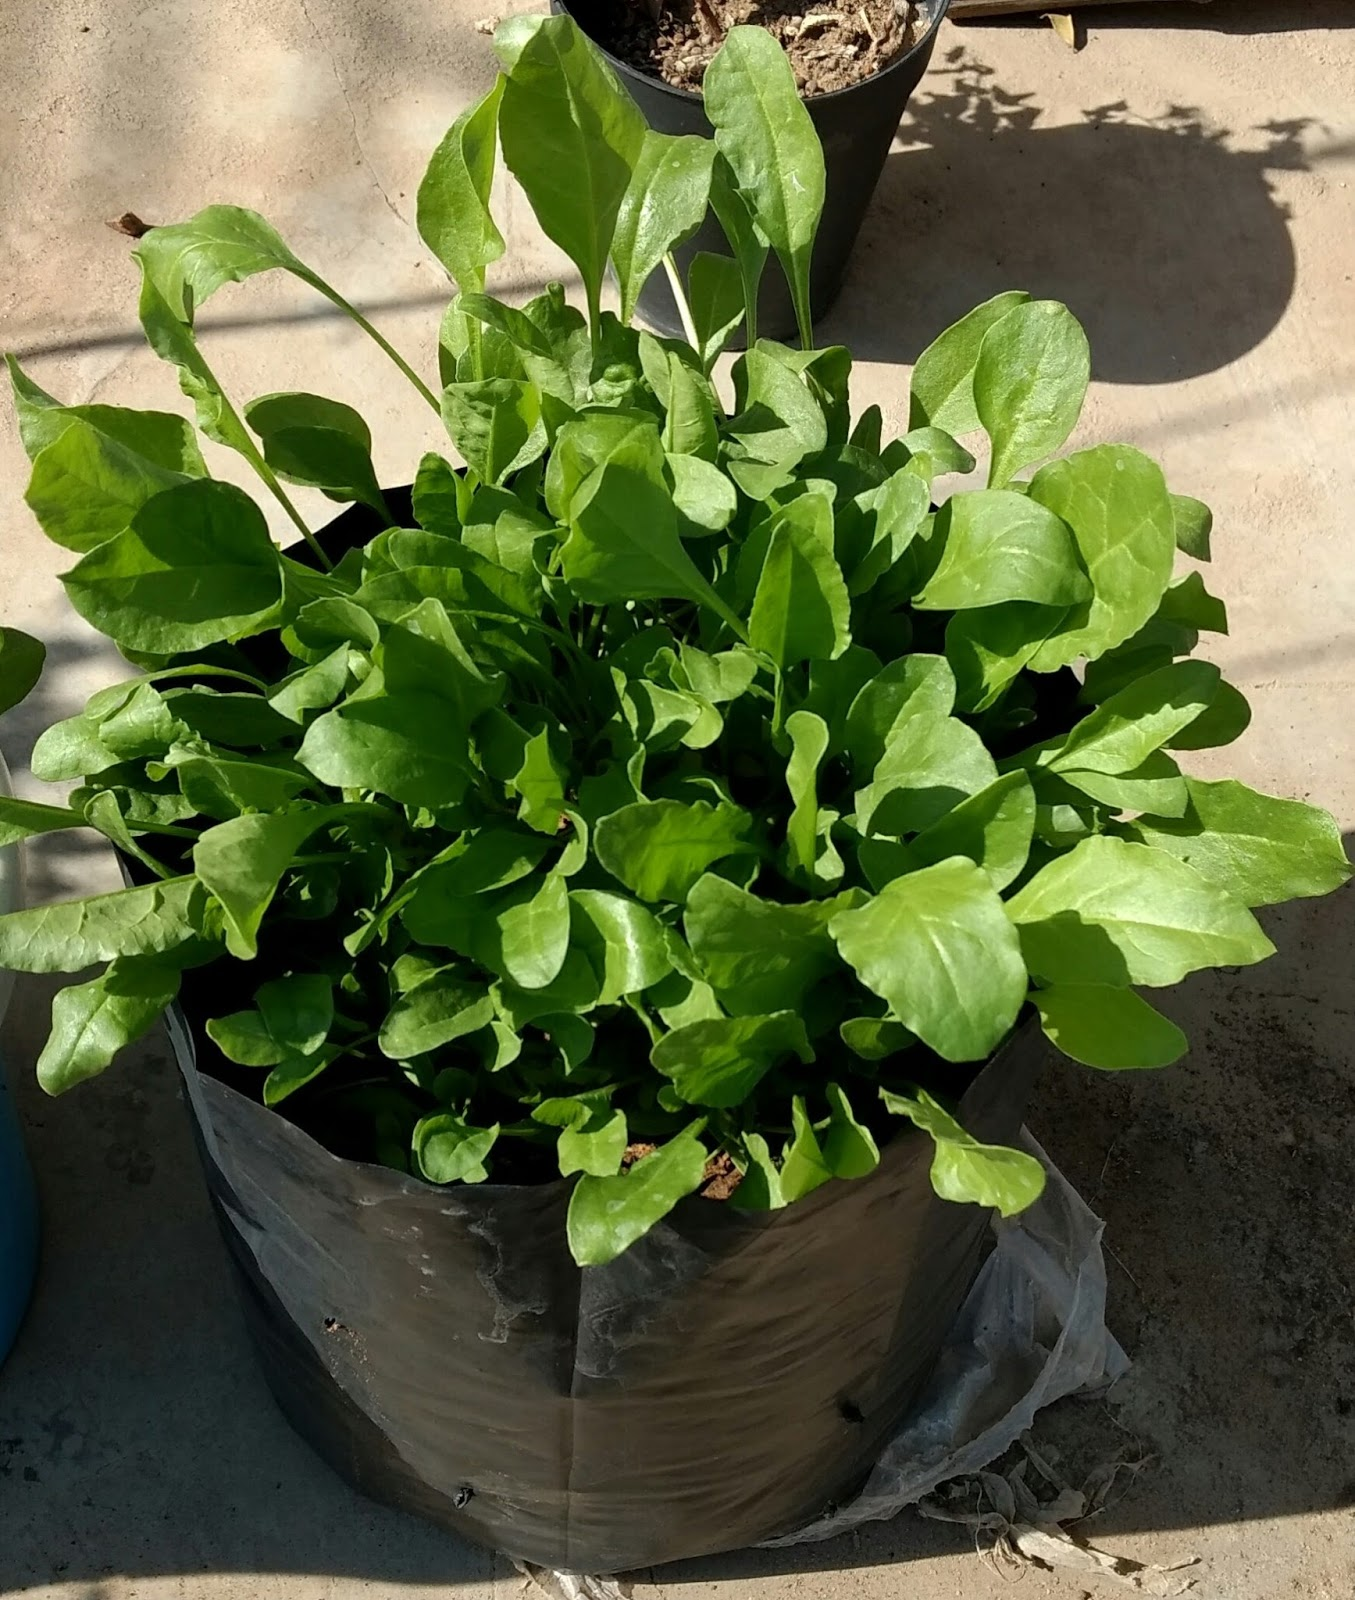 Garden Plants Nursery India Fertilizer Pots Bonsai Tools